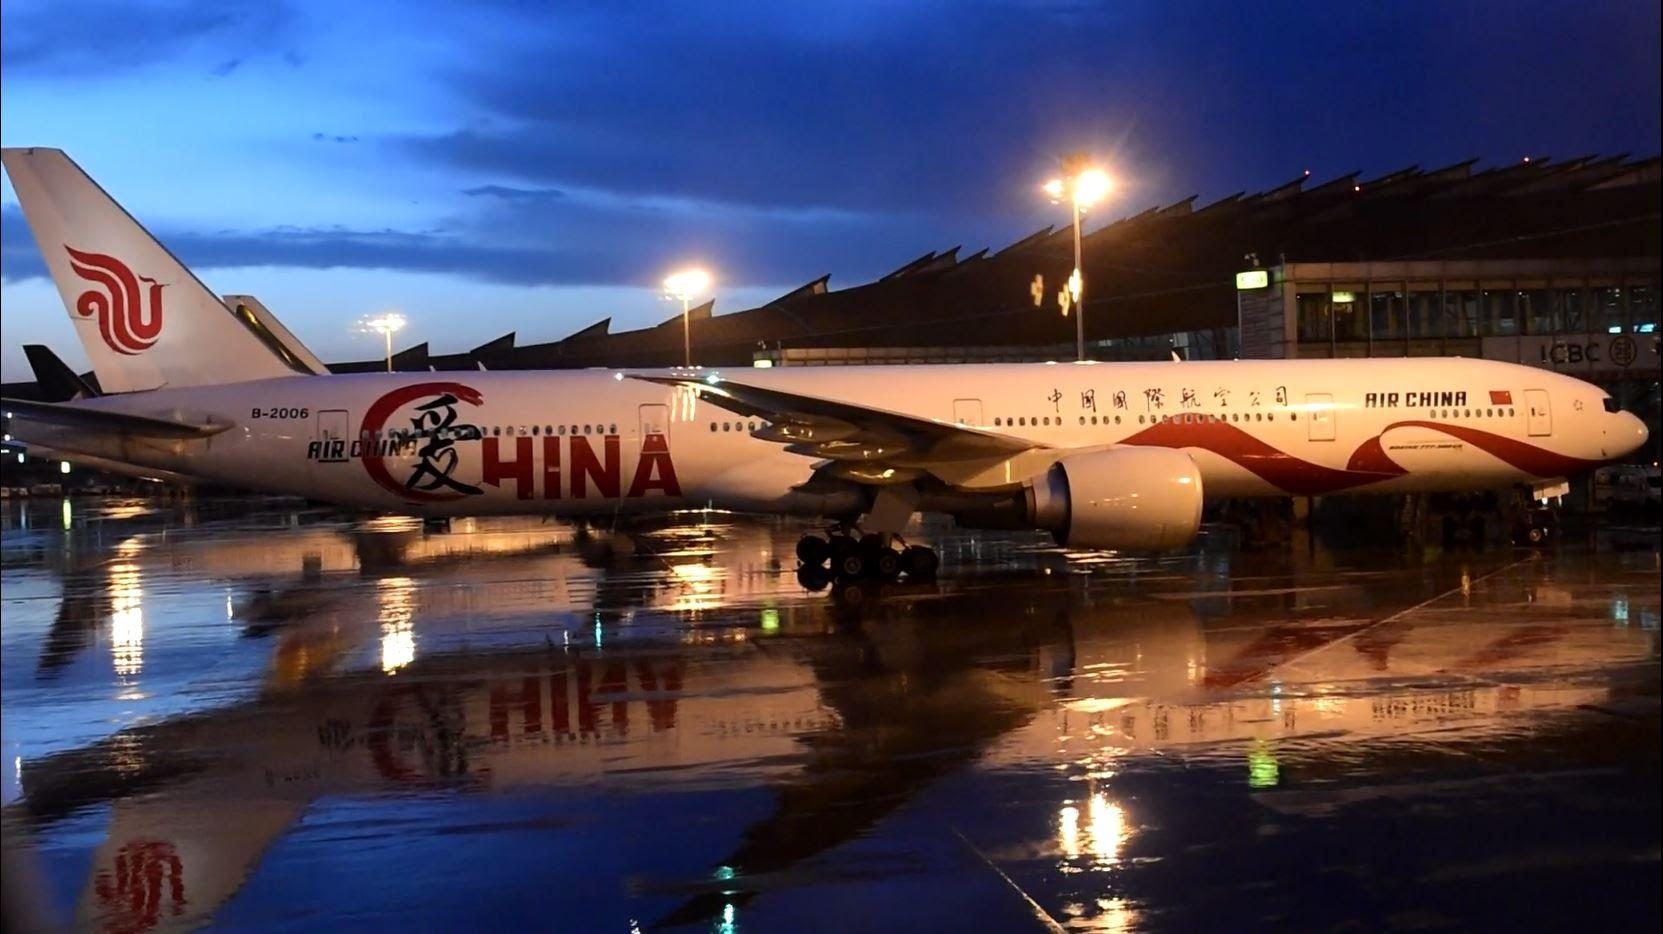 Air China 7478 Business Class CA982 New York JFK to